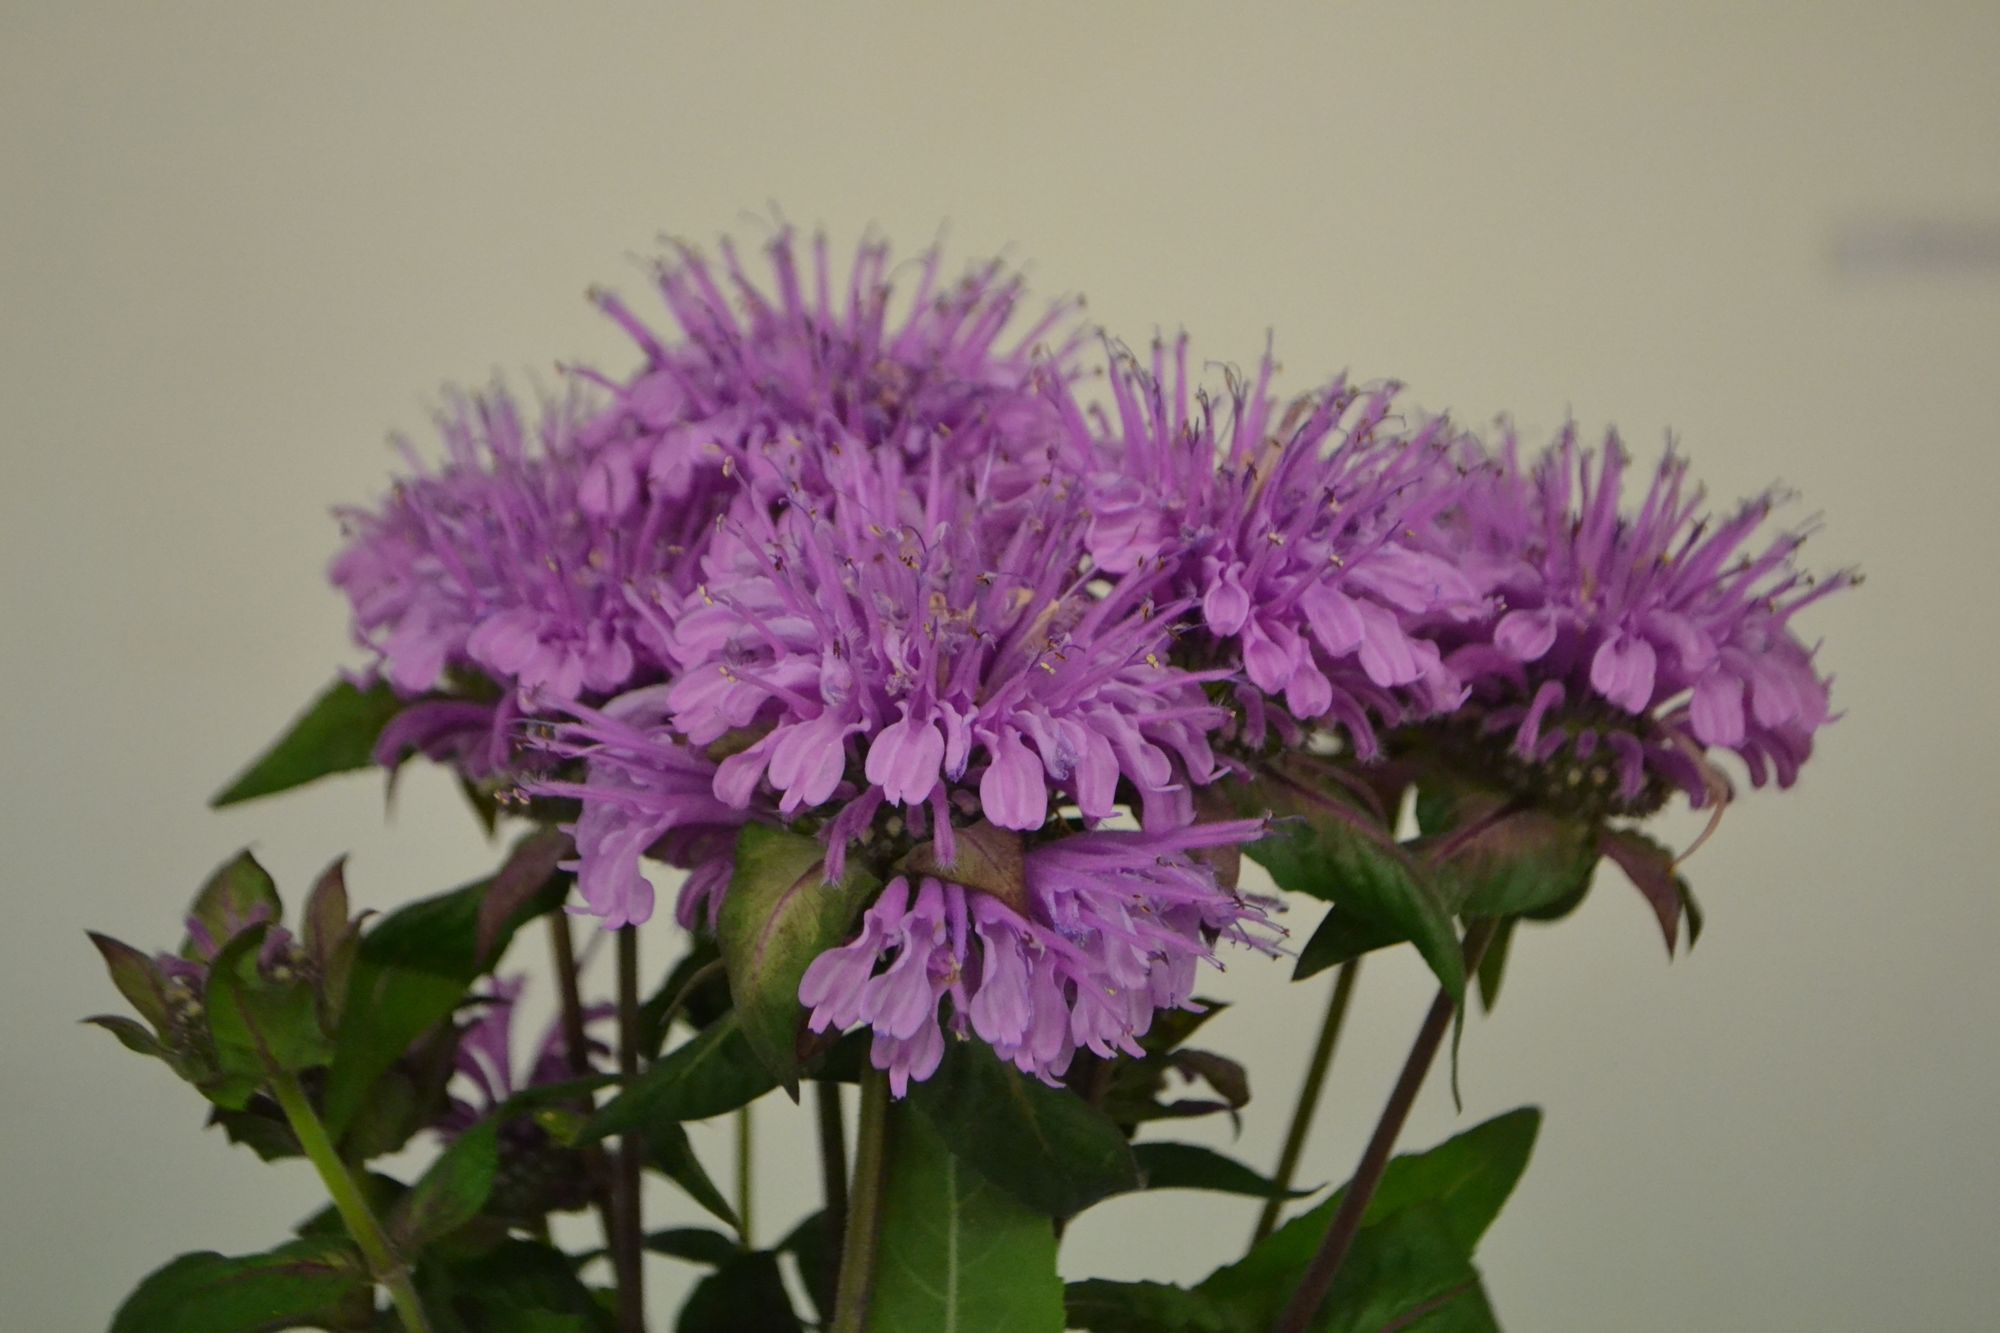 Vamzdelinė monarda, mėtalapis varietetas 'Mohikaner' (Monarda fistulosa, var. menthifolia)